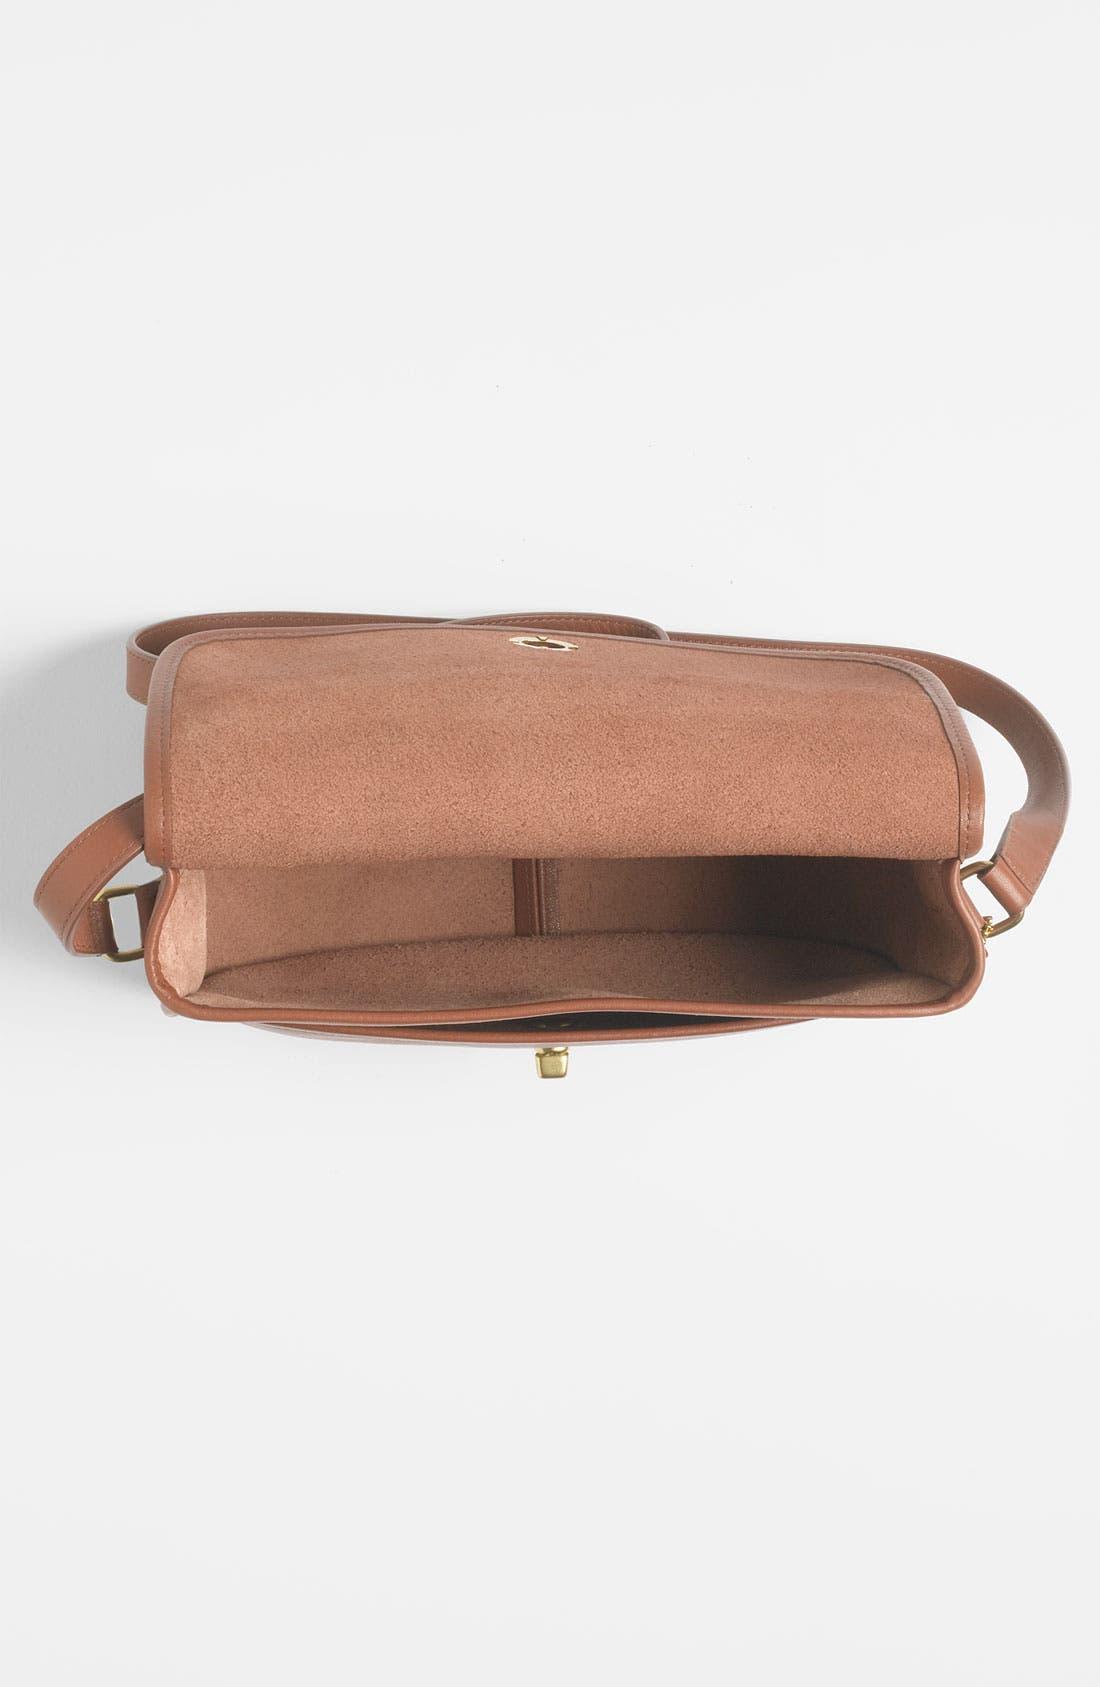 Alternate Image 3  - COACH 'City' Leather Crossbody Bag